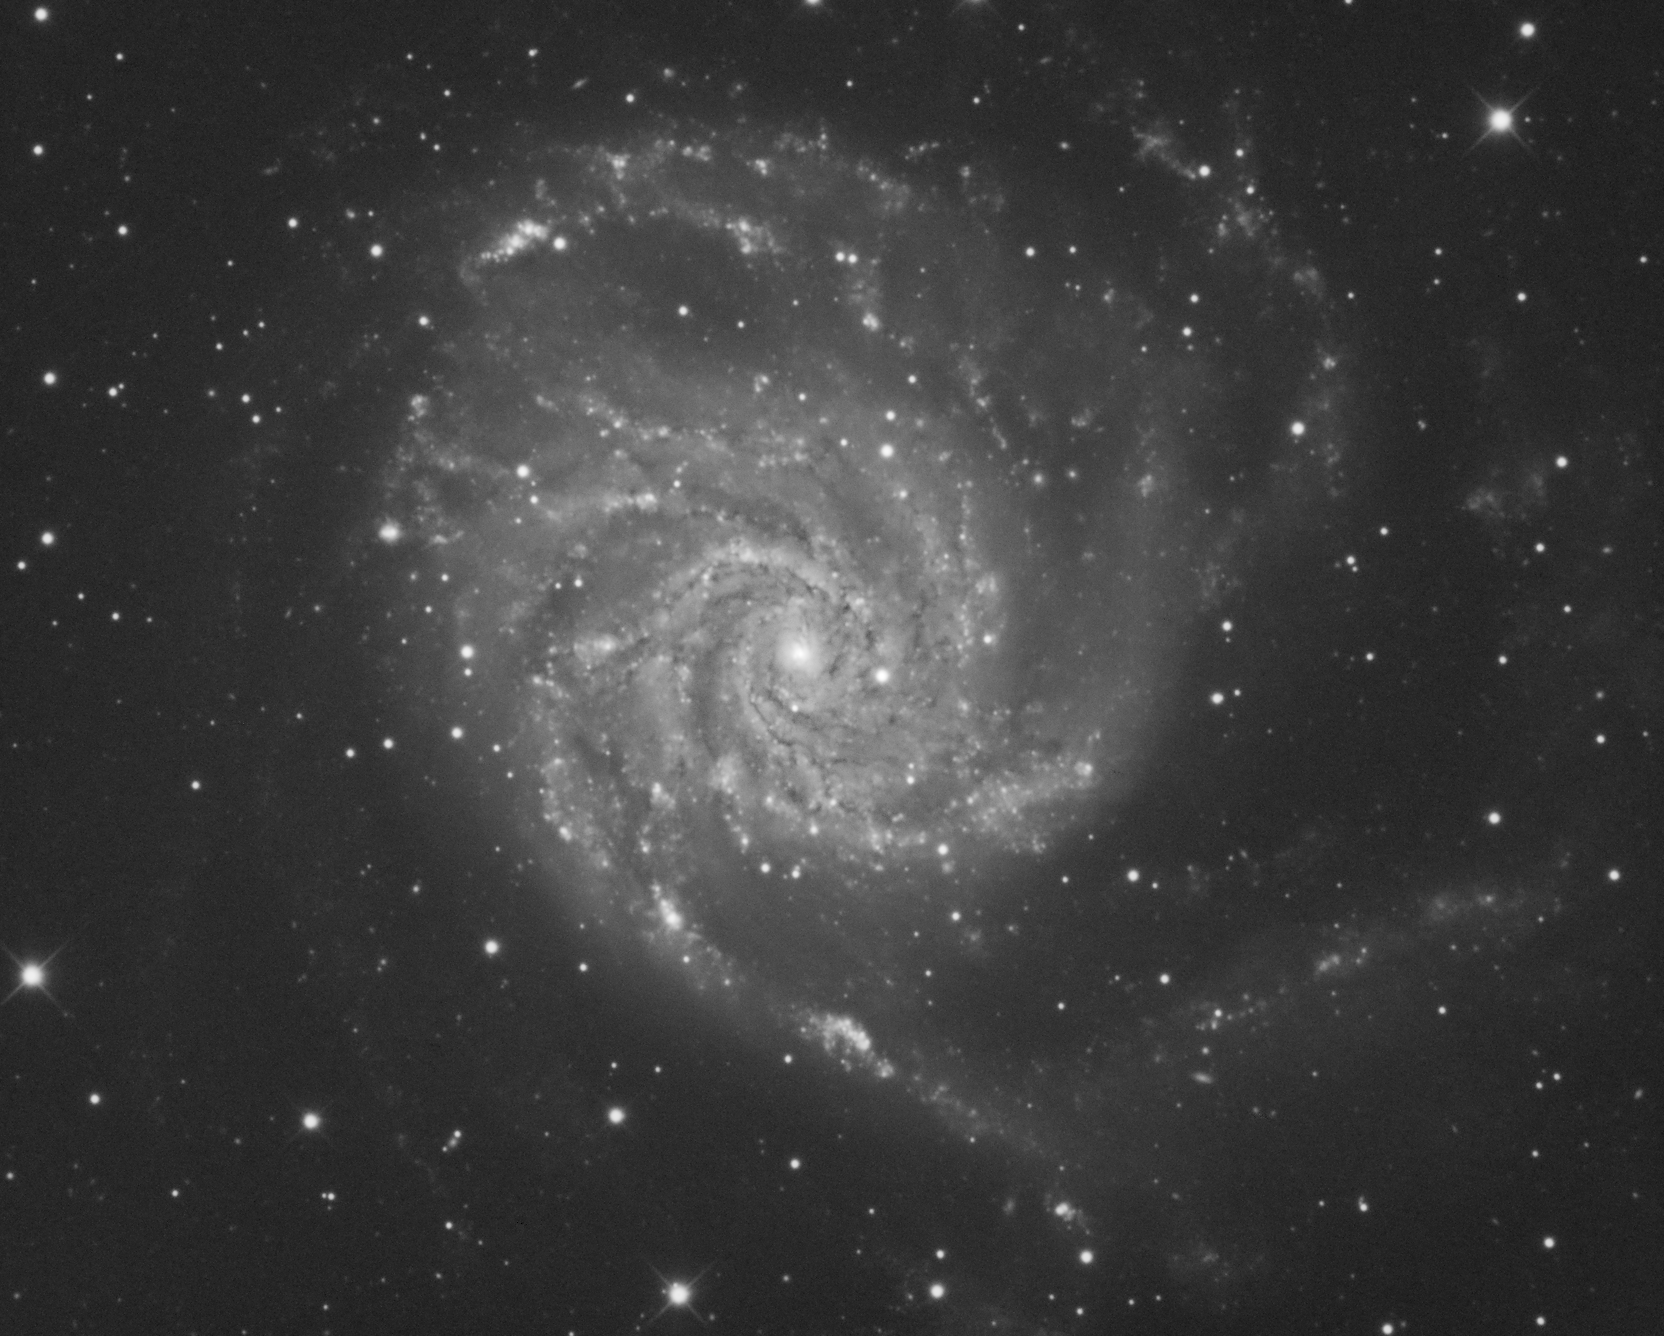 L_M101_v2.png.95126f81f5f16dad1395d424c0d9a95a.png